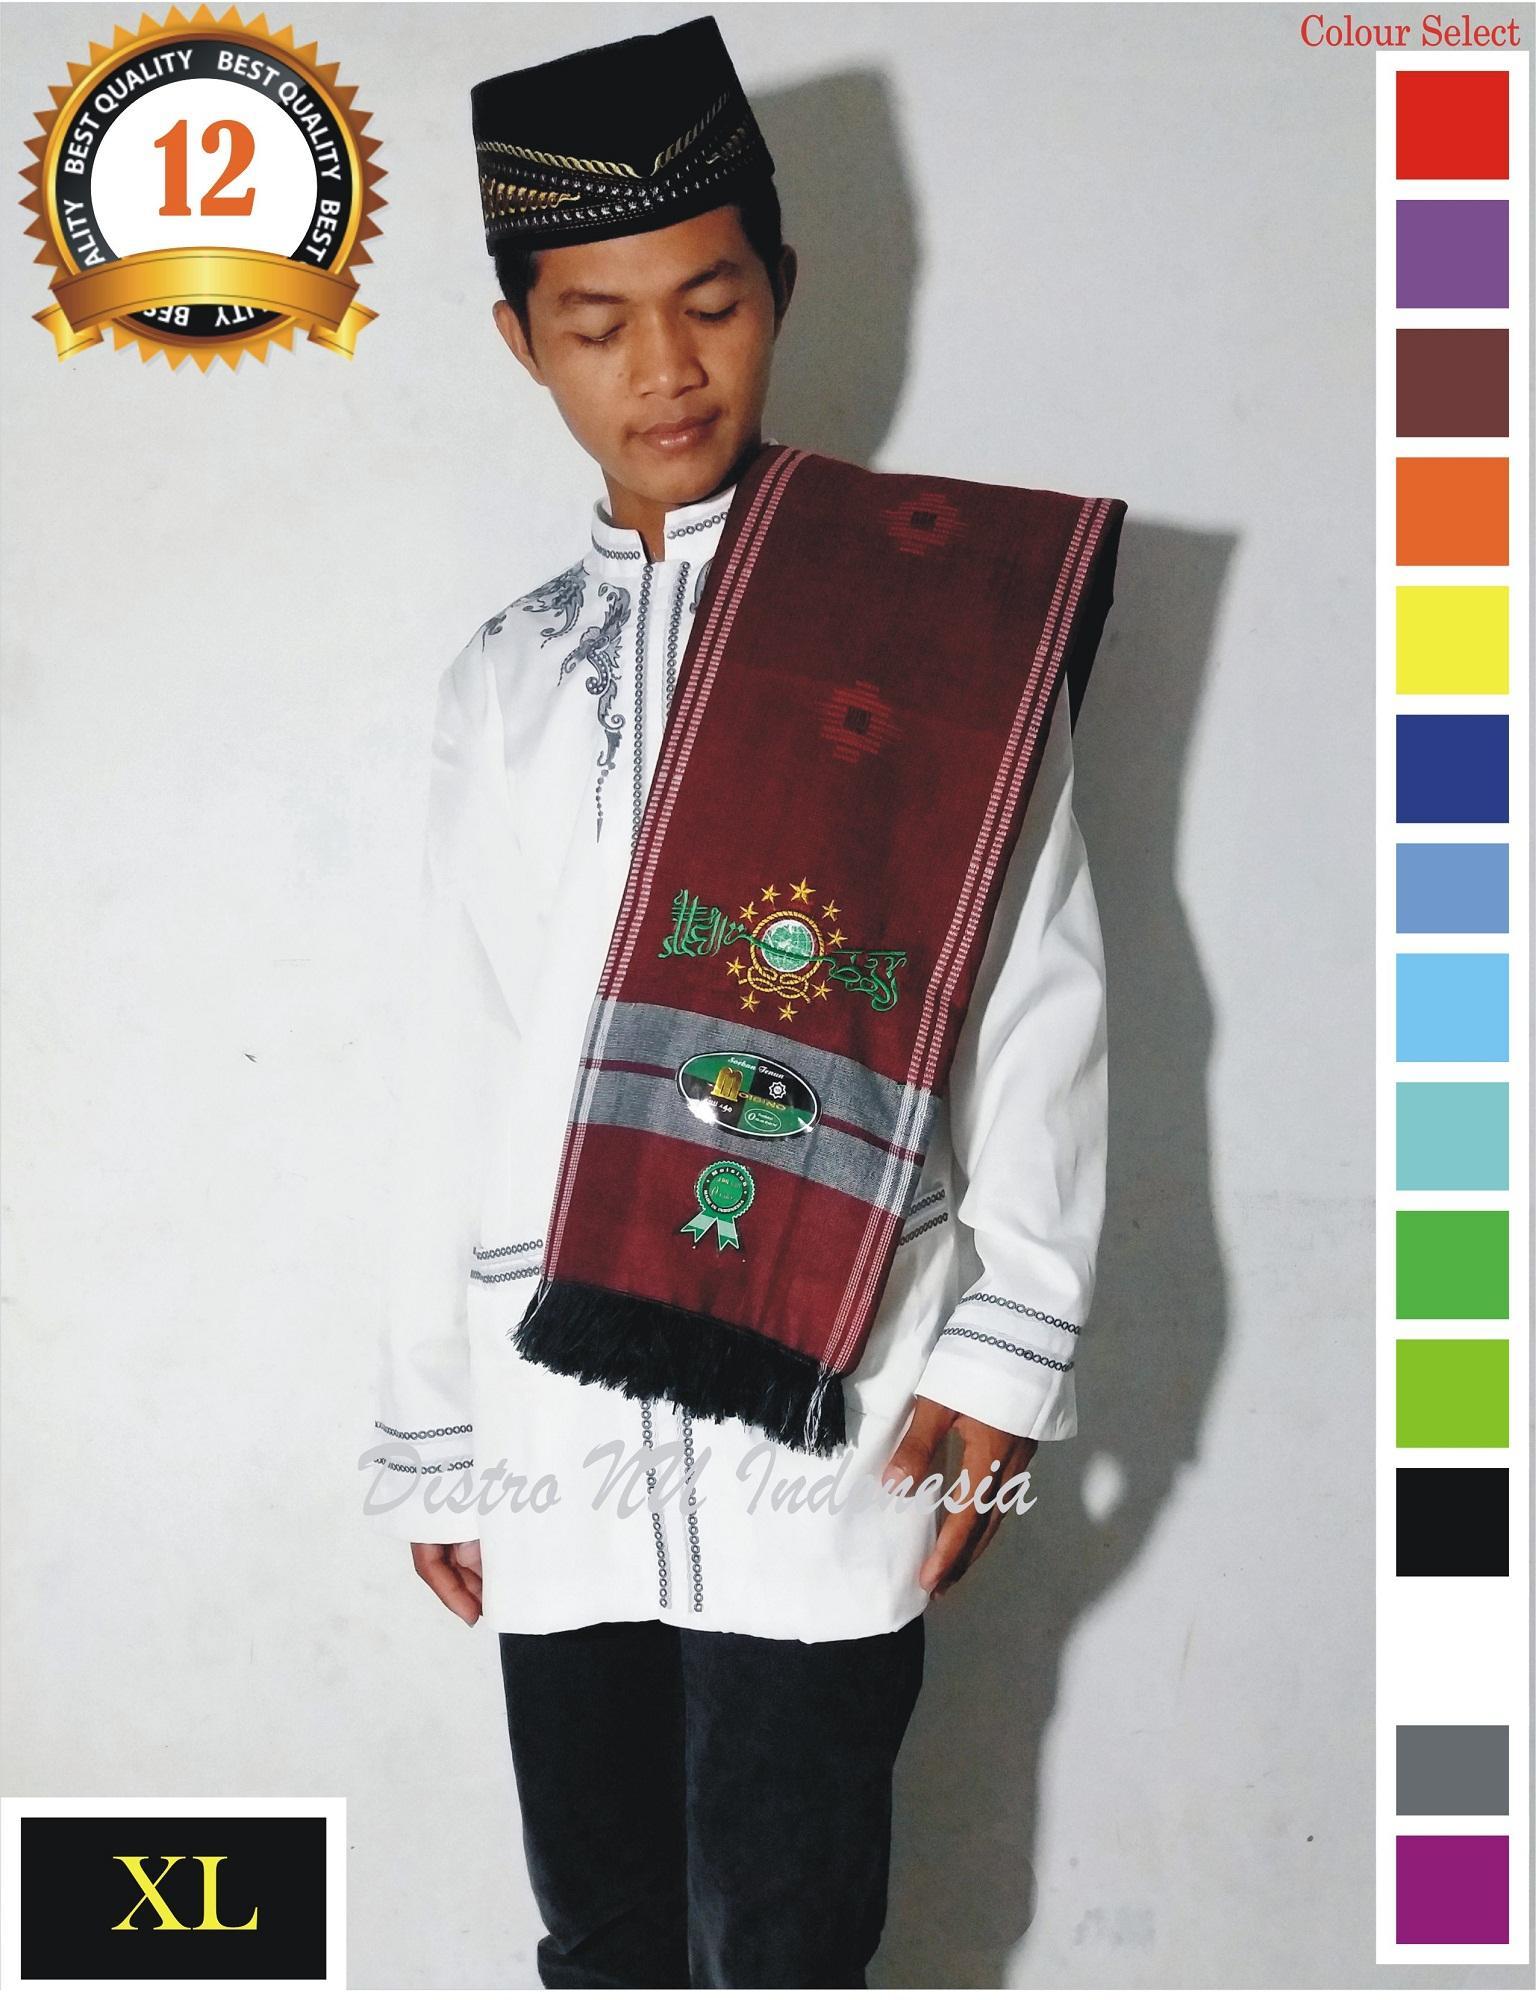 SORBAN NU XL BORDIR TEBAL BAGUS TENUN MO MERAH  / surban / sajadah / sarung / batik nu / jasko / koko / busana muslim / peci / songkok / gamis / jubah / sarung nu / jas nu / jasket / kerudung baru / baju wanita / kemeja / kaos distro / kaos lukis / kopri